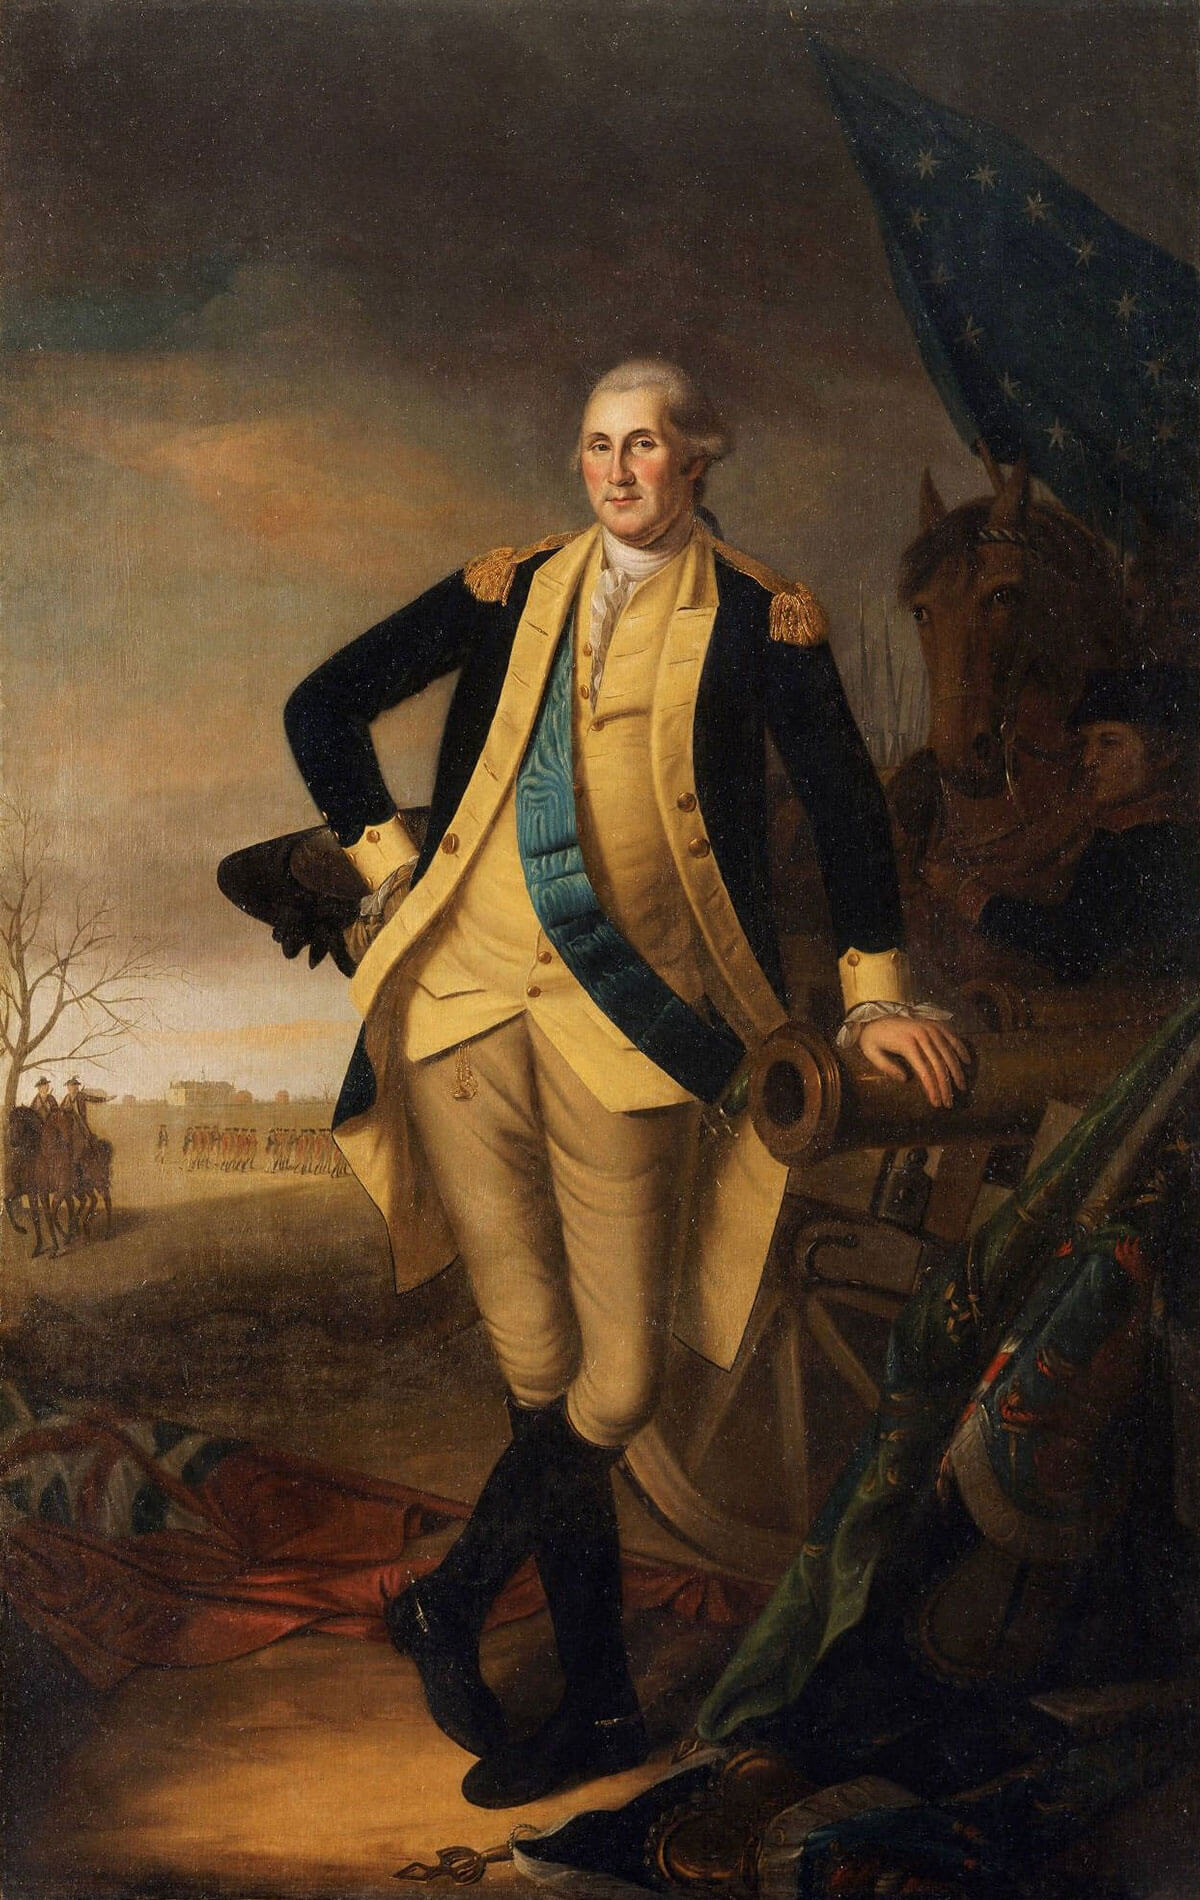 George Washington at Princeton, James Peale, 1782, The Metropolitan Museum of Art